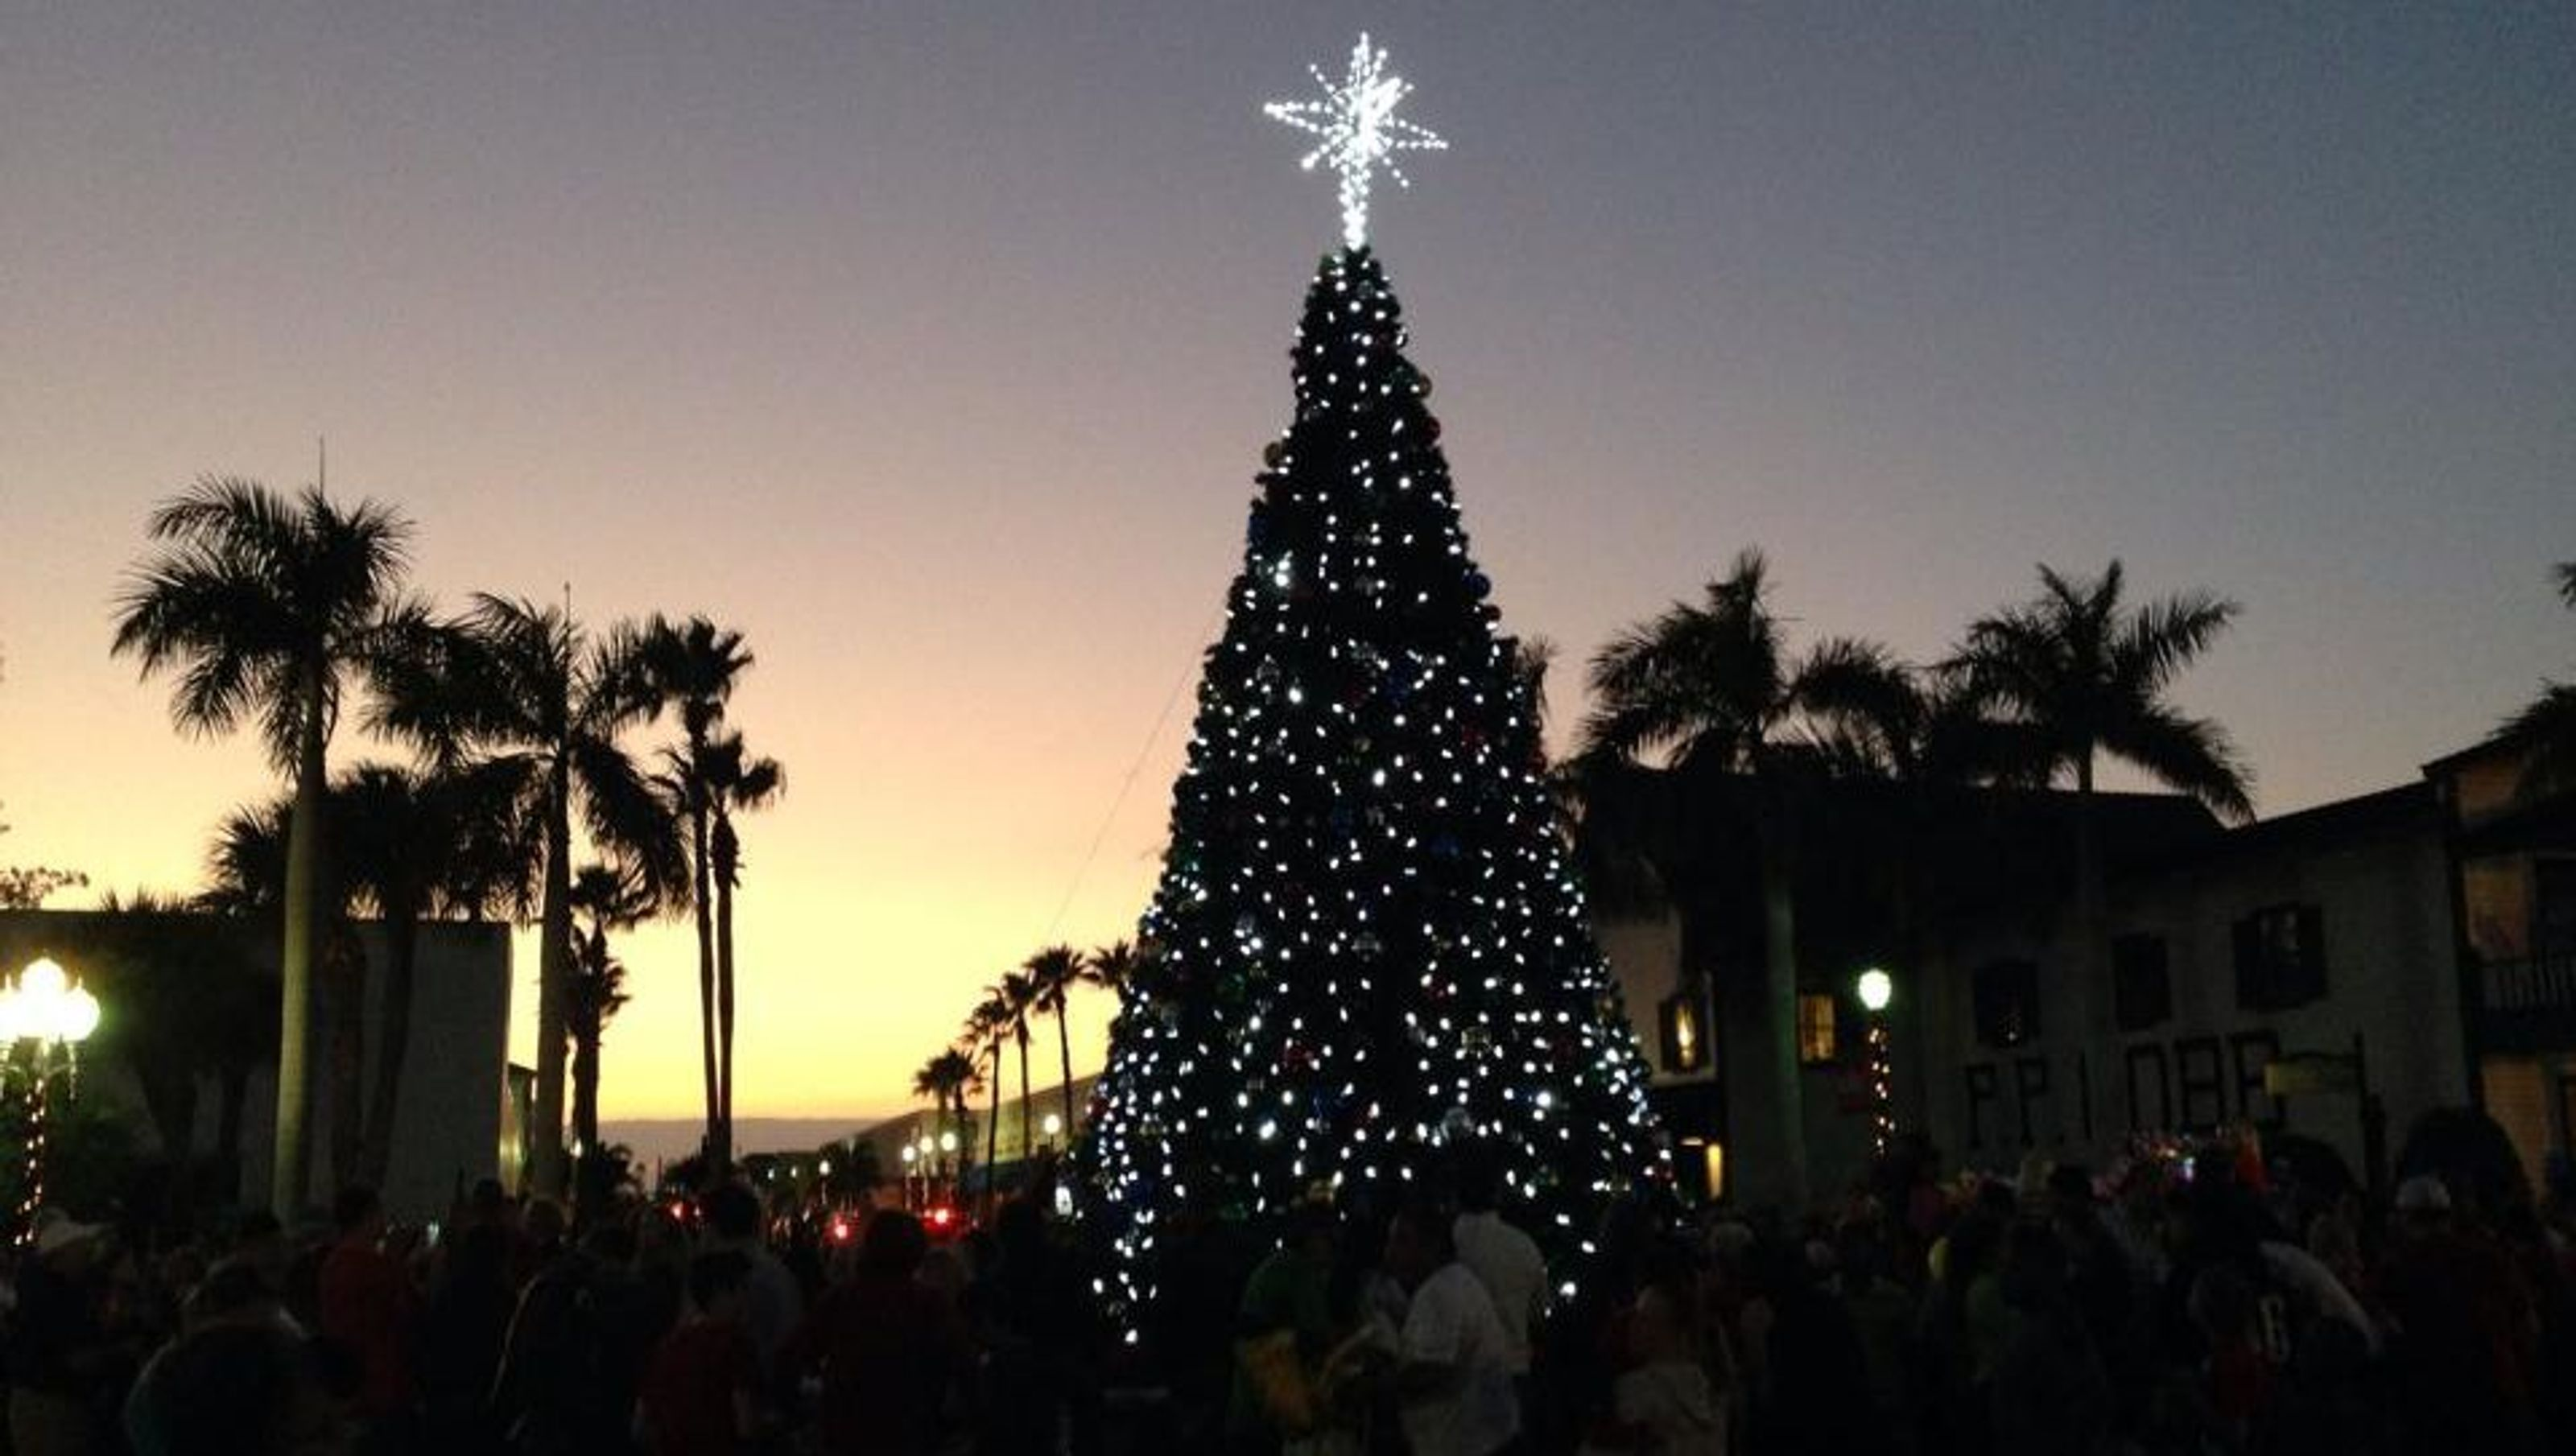 The lighting of the downtown Fort Pierce, Florida Christmas Tree.